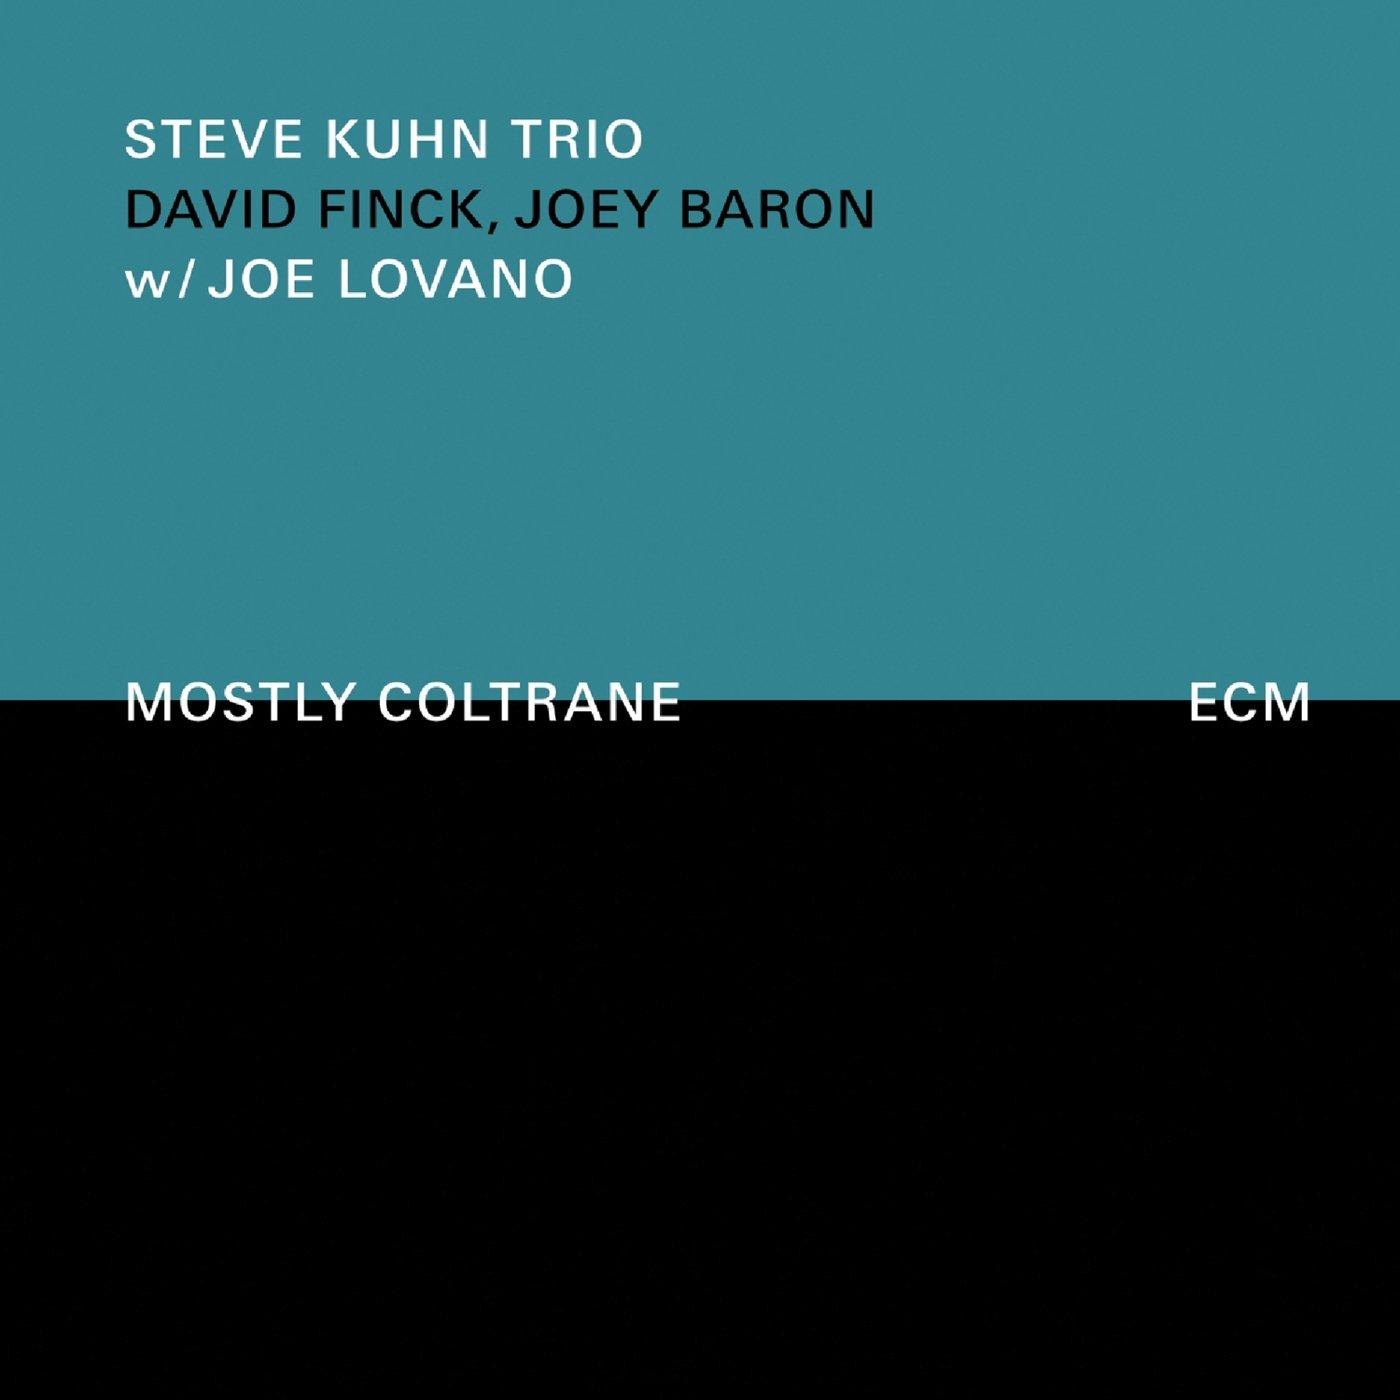 Image result for The Steve Kuhn Trio w/ Joe Lovano: Mostly Coltrane